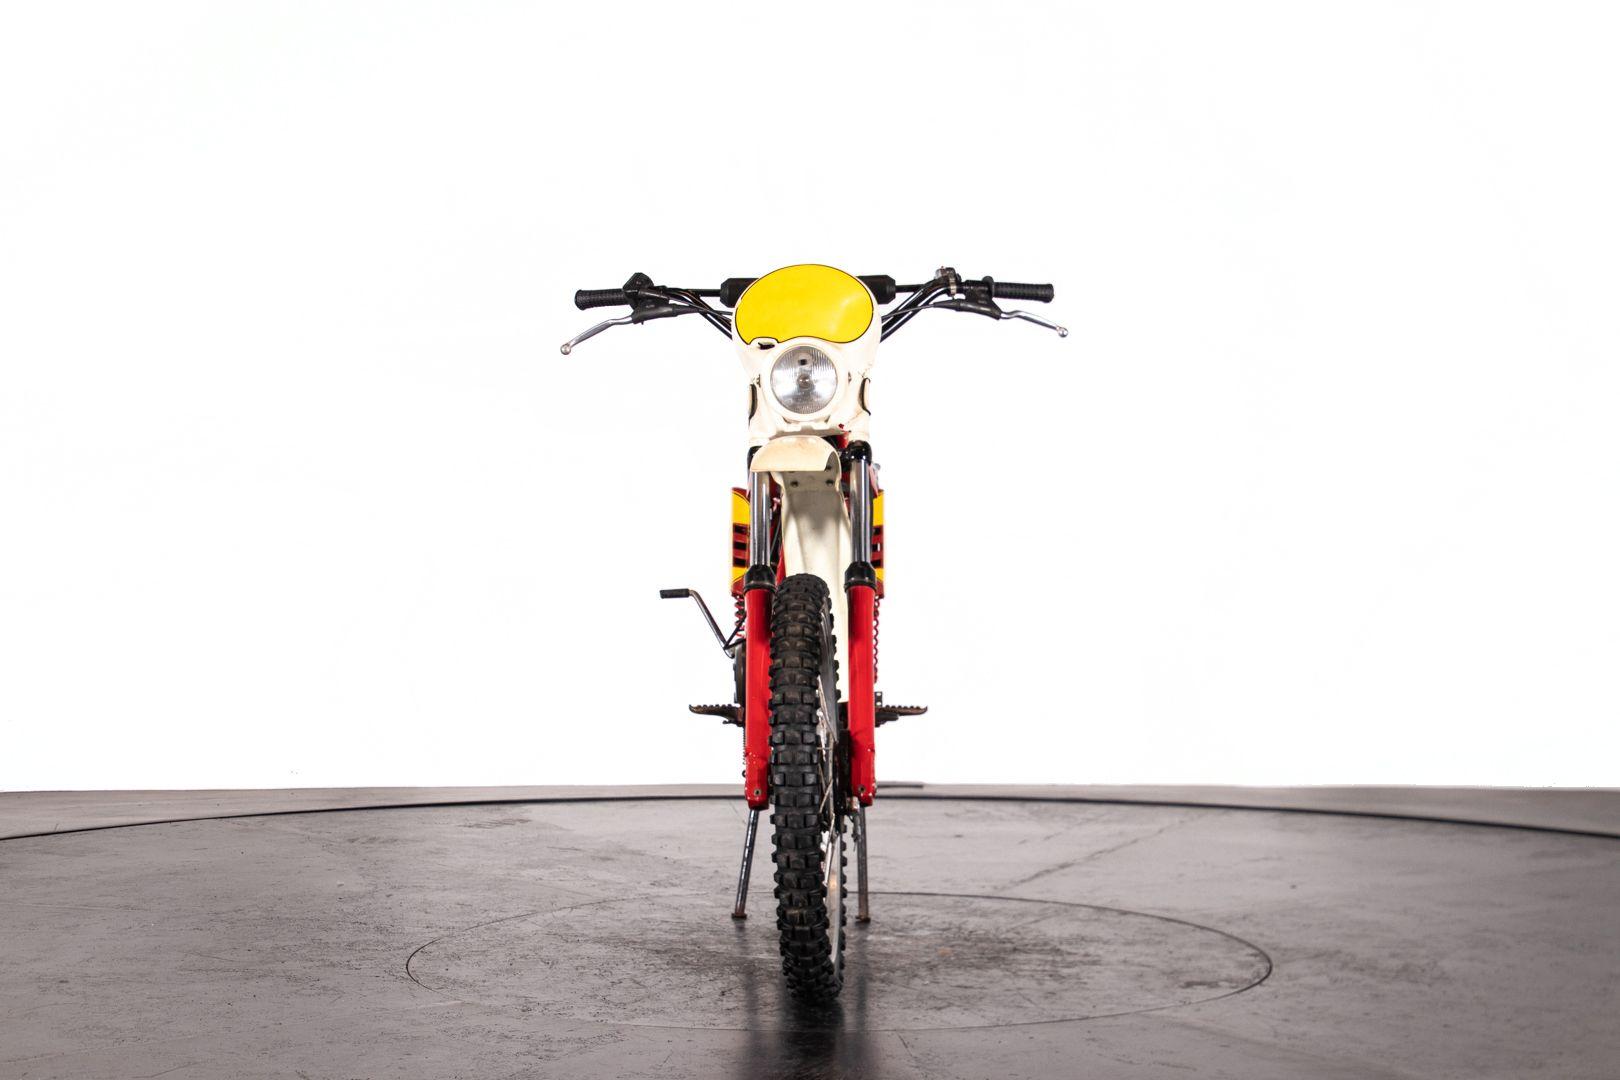 2000 FANTIC MOTOR TX 190 48884